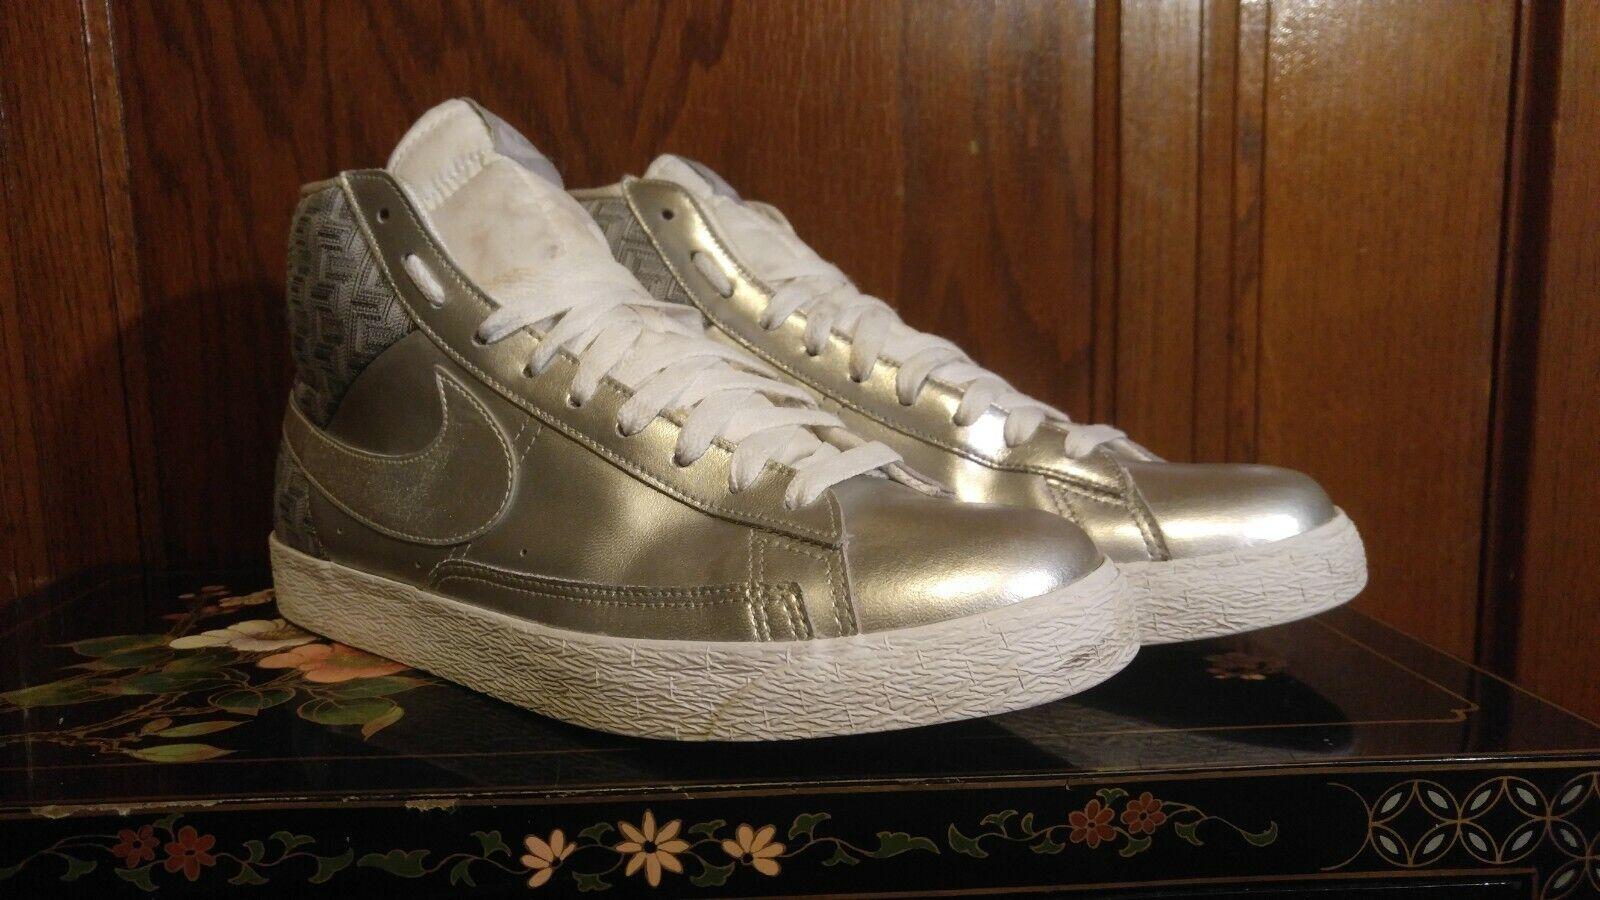 2010 Nike Blazer Silver Foamposite shoes With Box